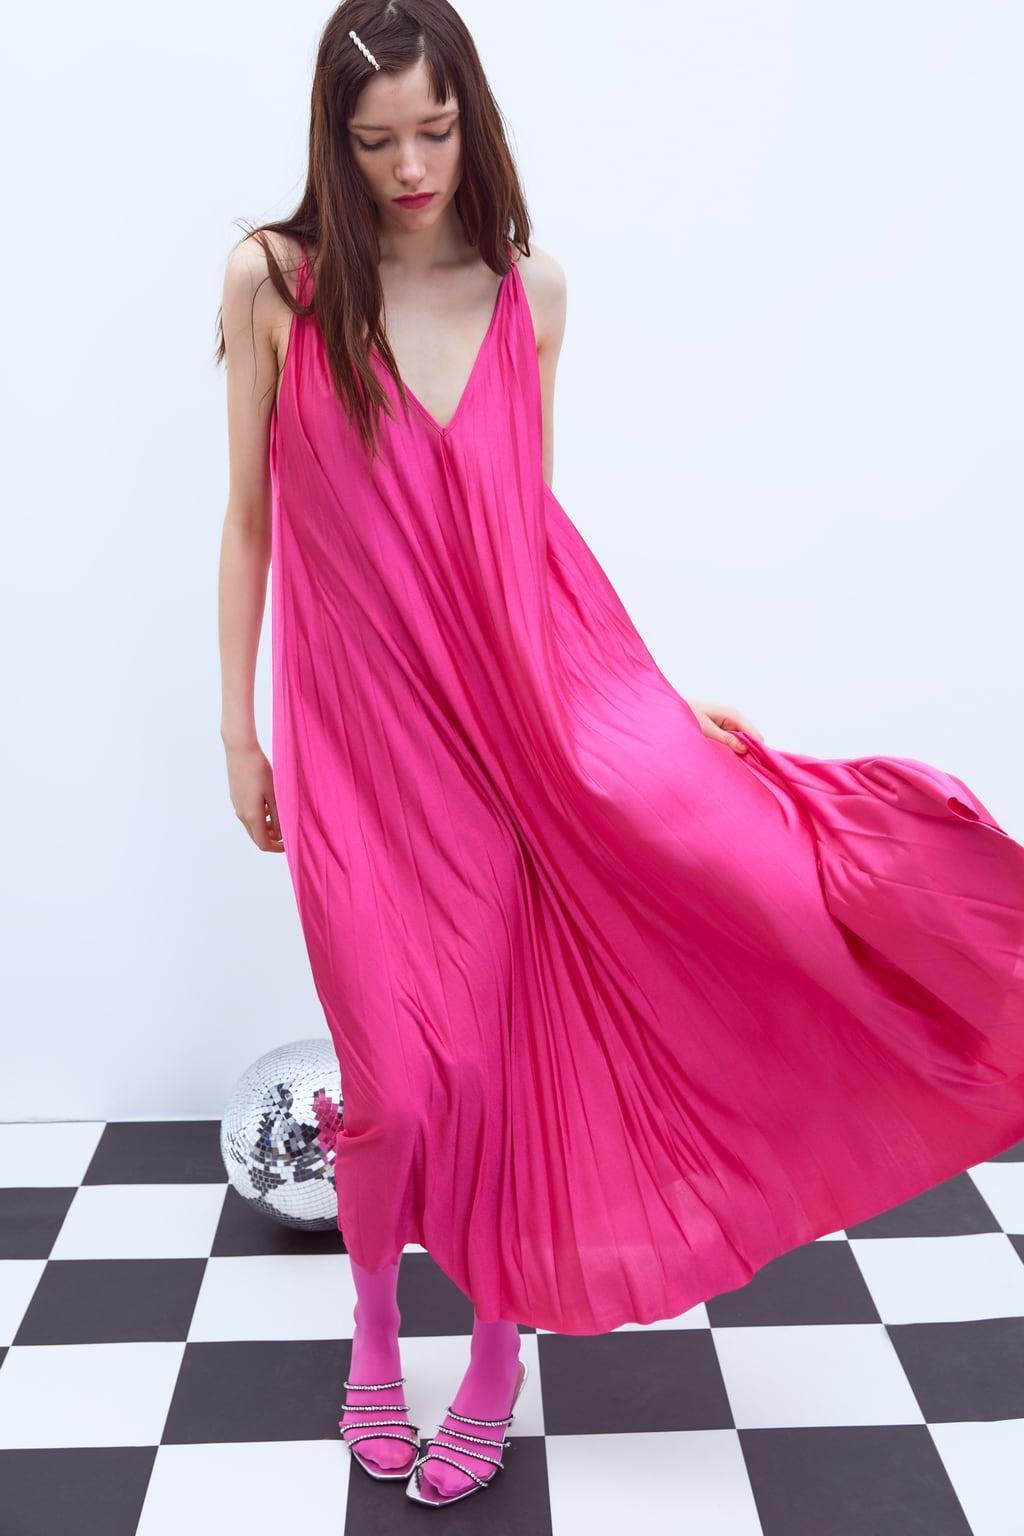 ae69199e12 vestido fiesta zara. Vestidos que disimulan tripa